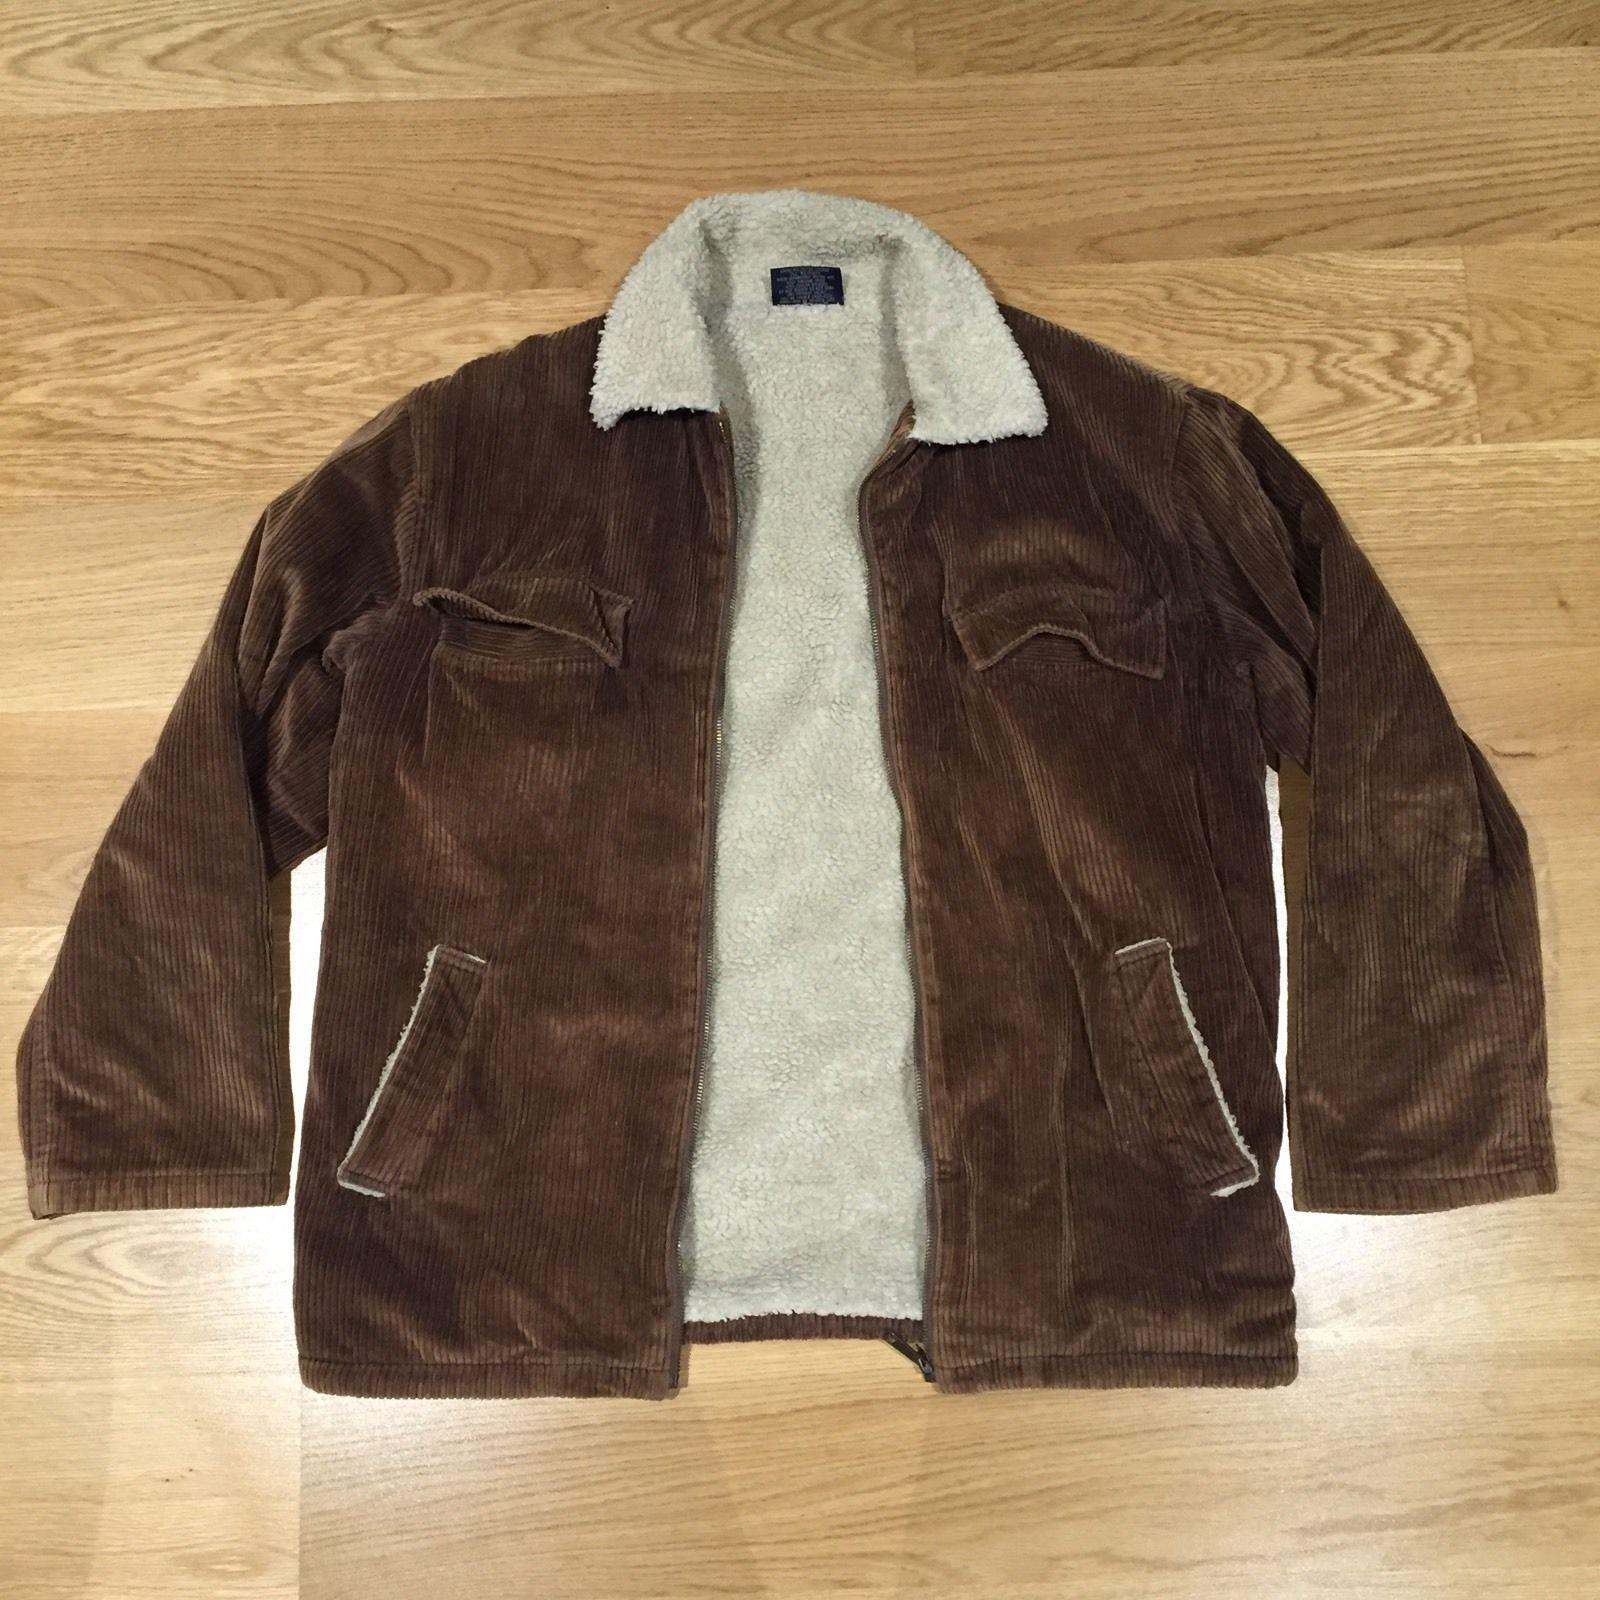 Light Brown Corduroy Jacket MEN'S Polyester Viscose Lining